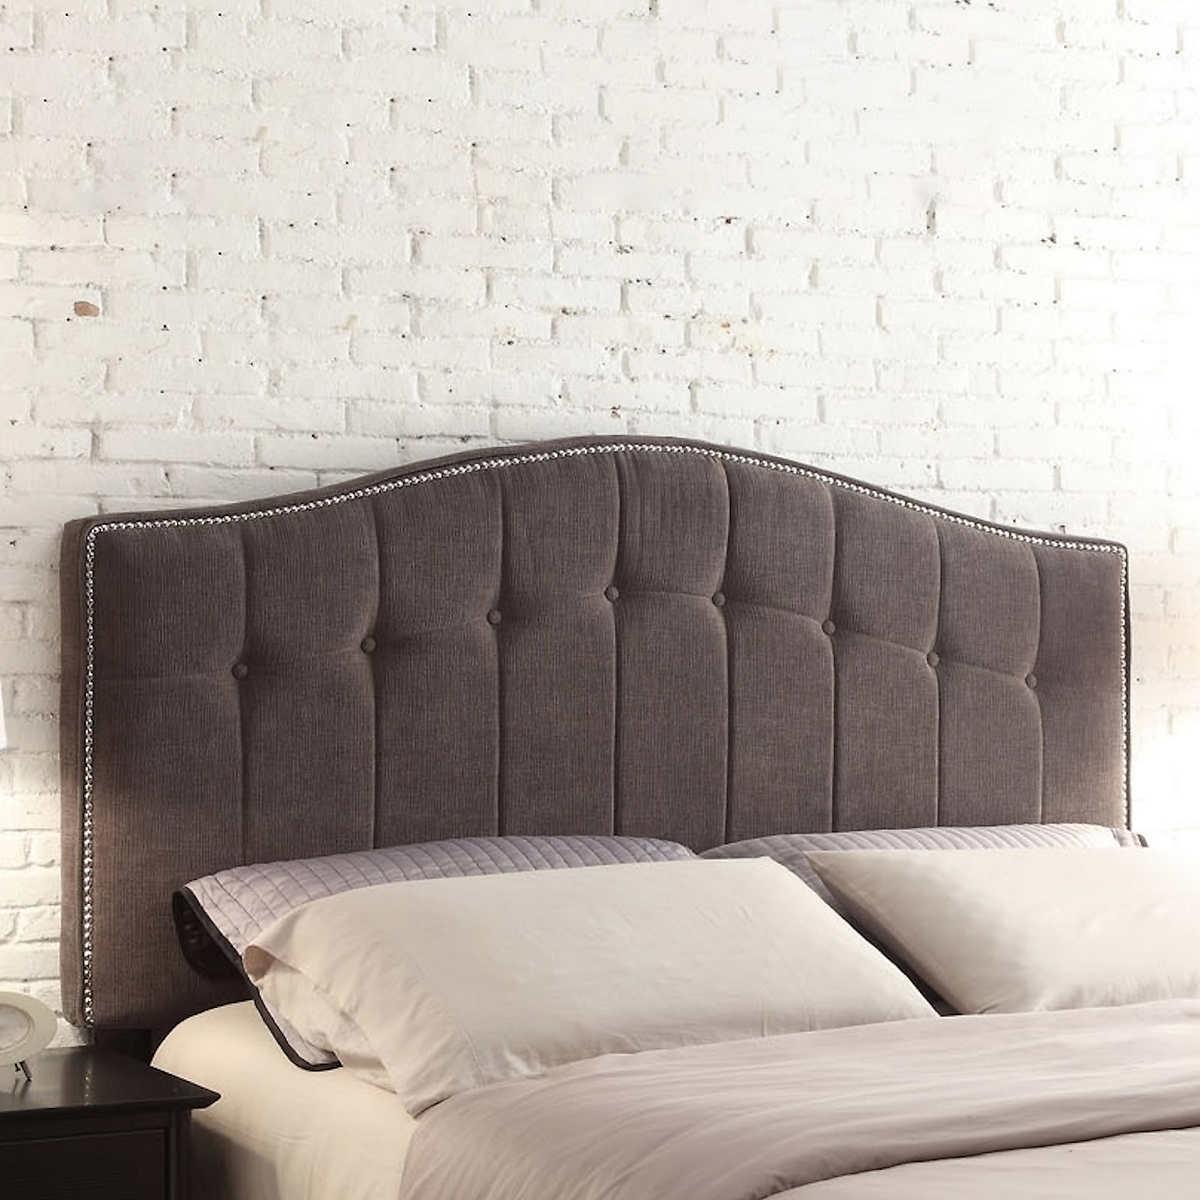 Bed frames headboards - Sonoma Grey Headboard